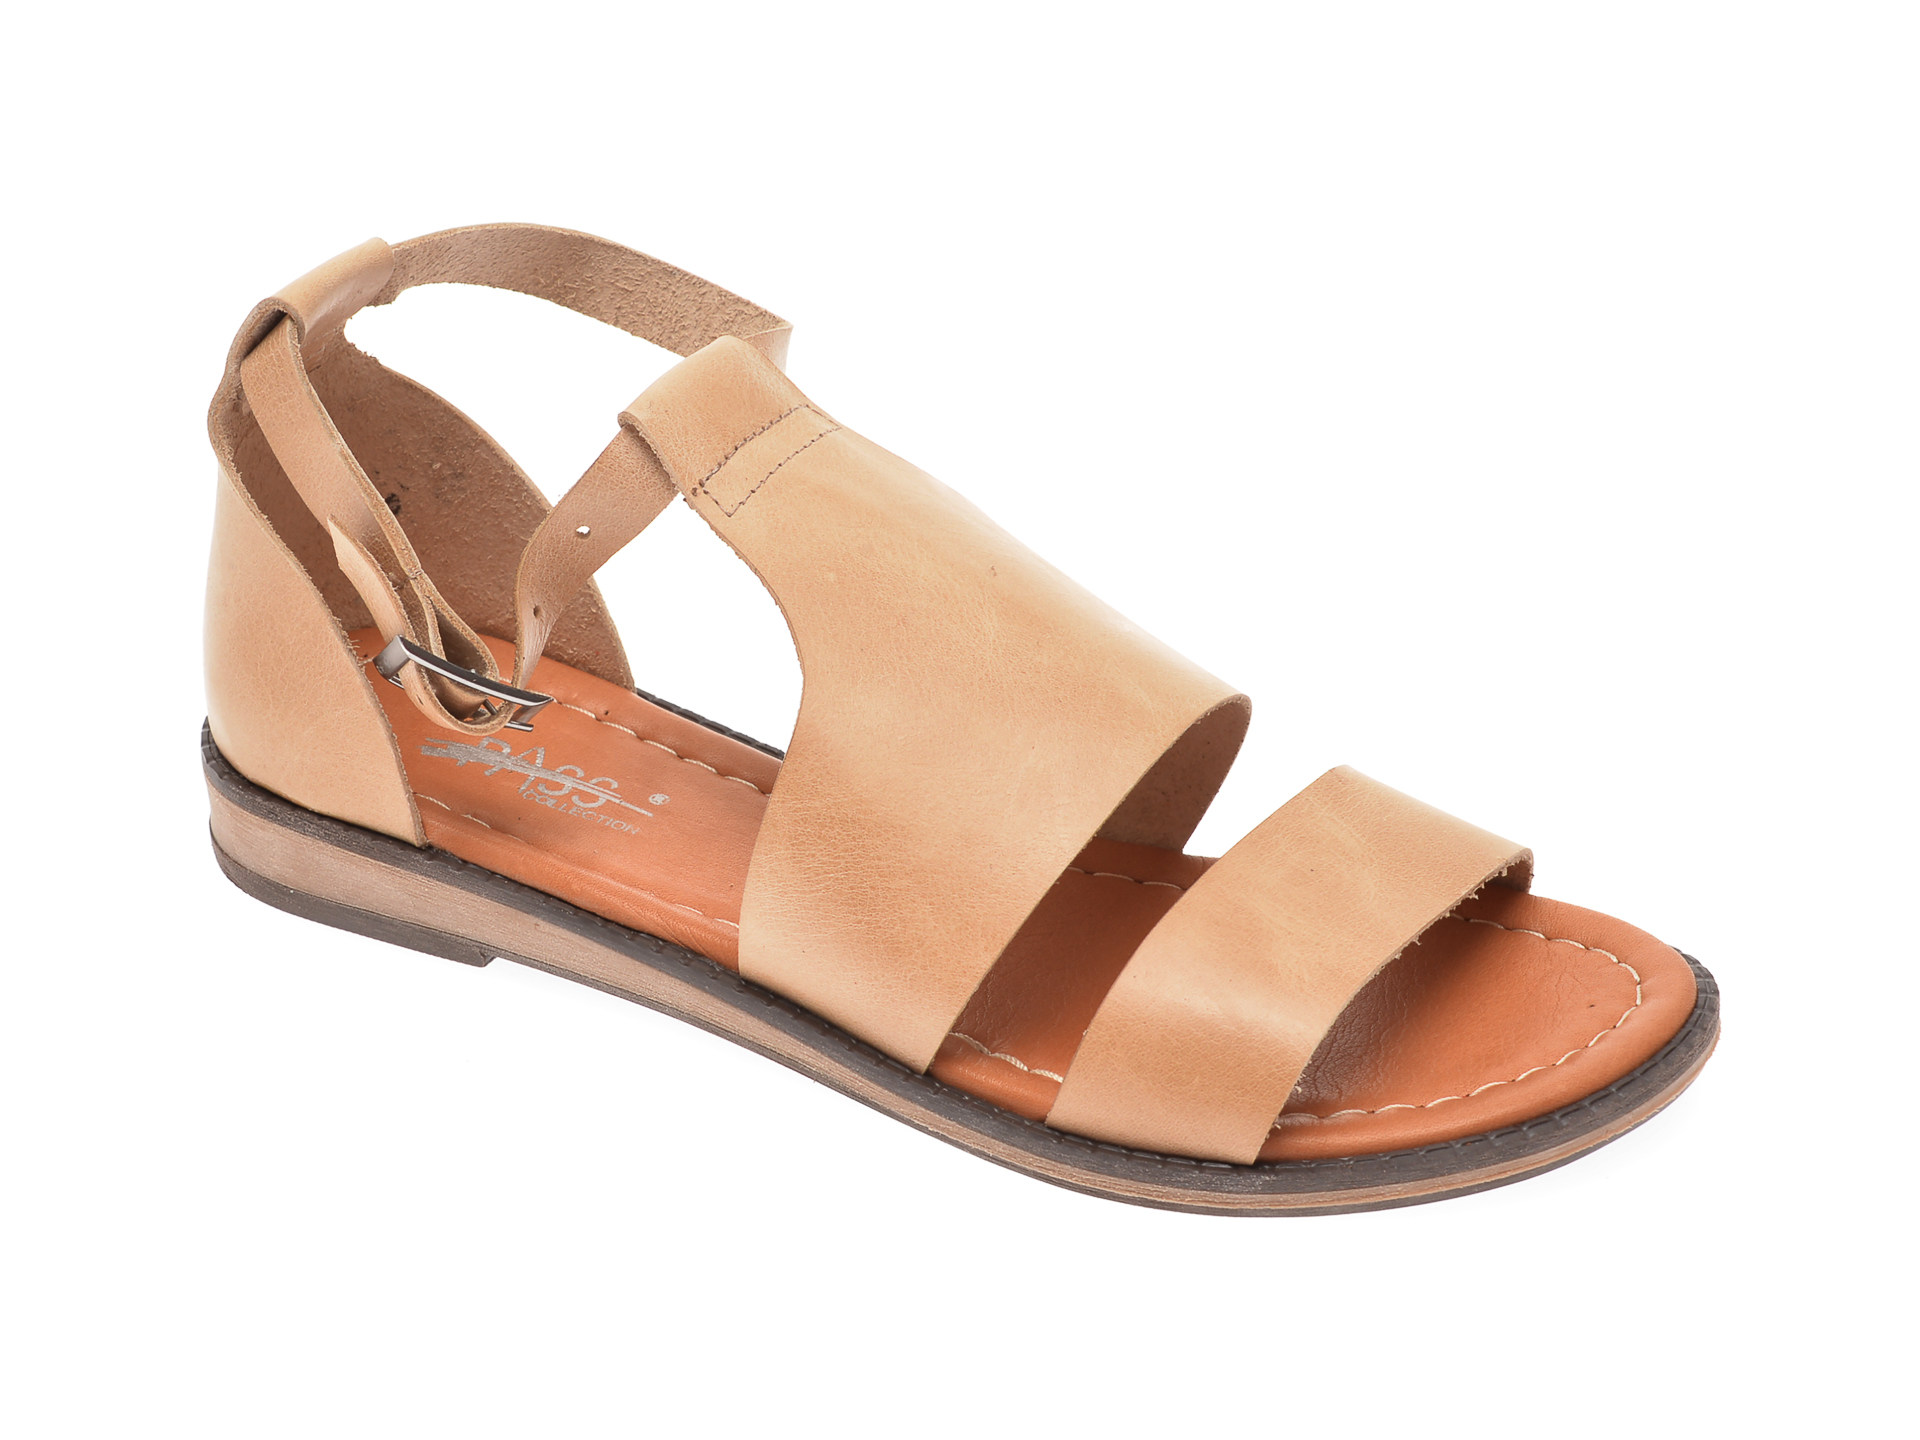 Sandale PASS COLLECTION bej, 1004K, din piele naturala